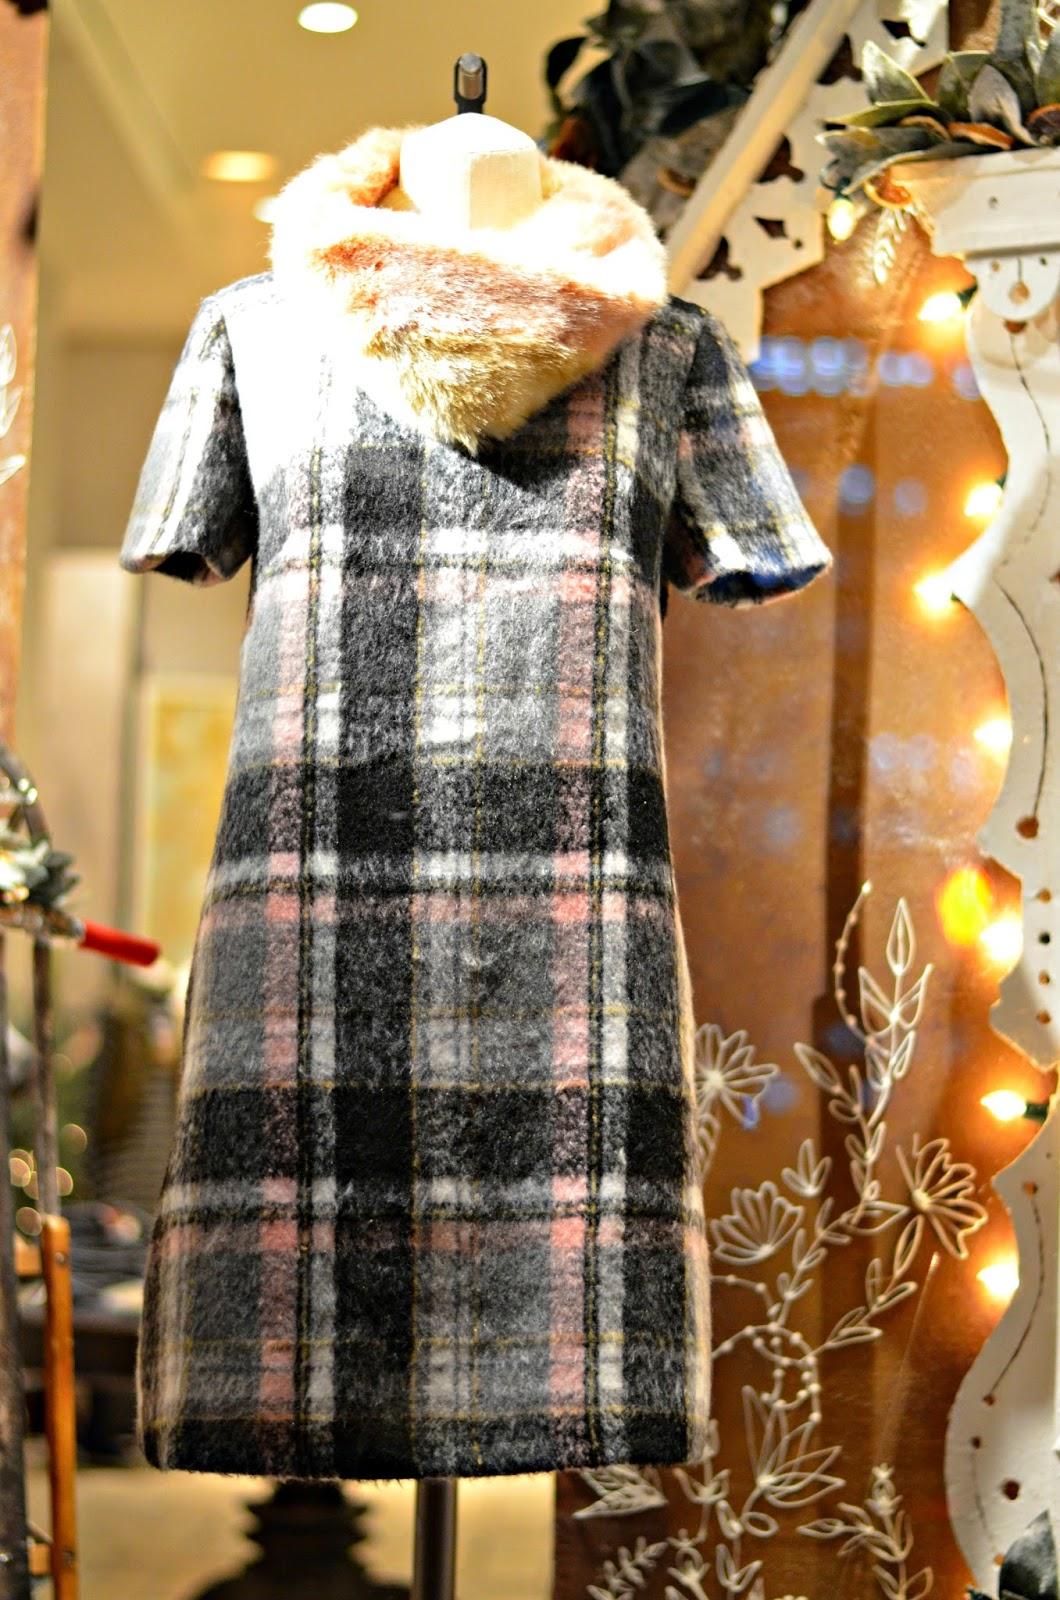 December Shops Windows at Rockefeller Center